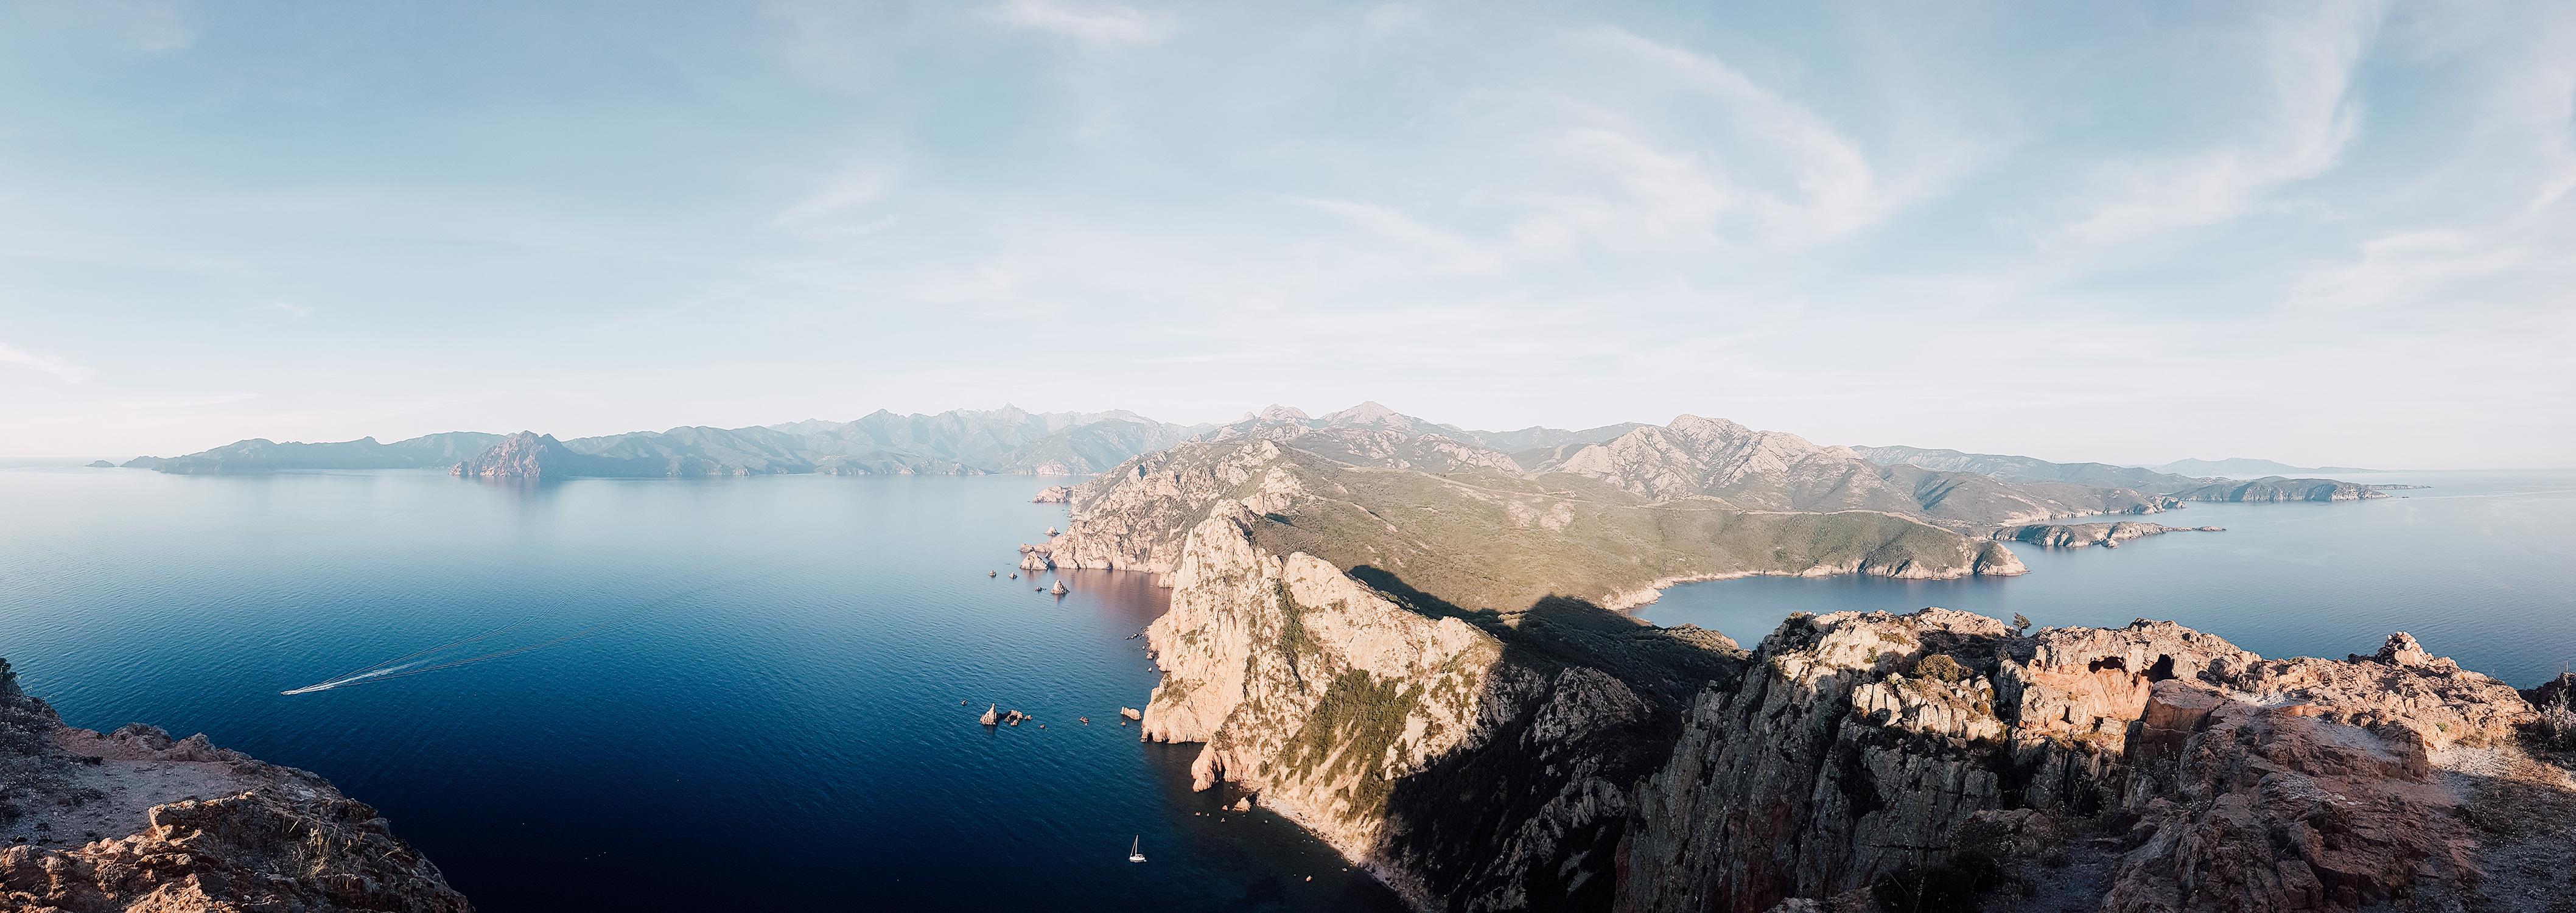 Panorama sur le Capo Rosso